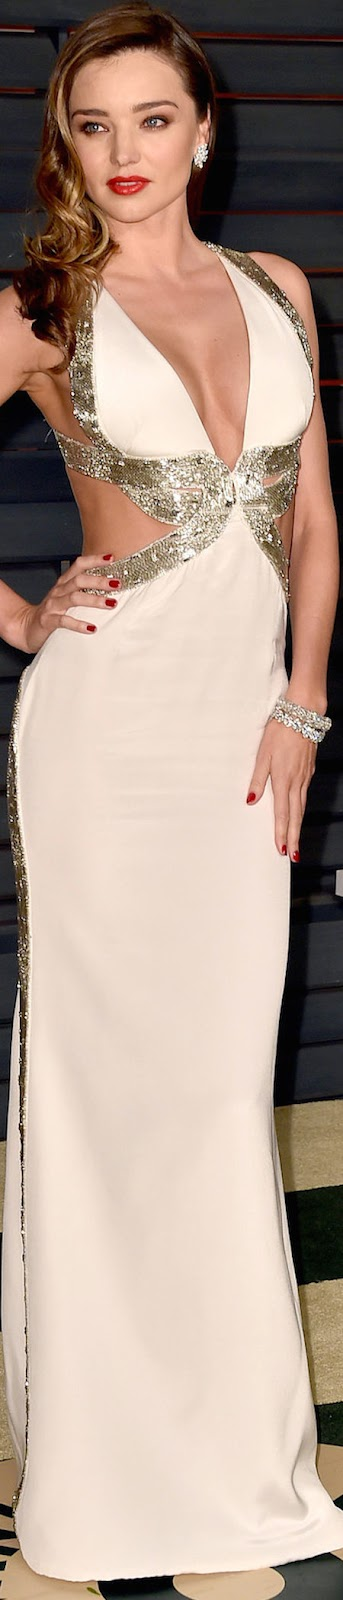 2015 Vanity Fair Oscar Party Miranda Kerr